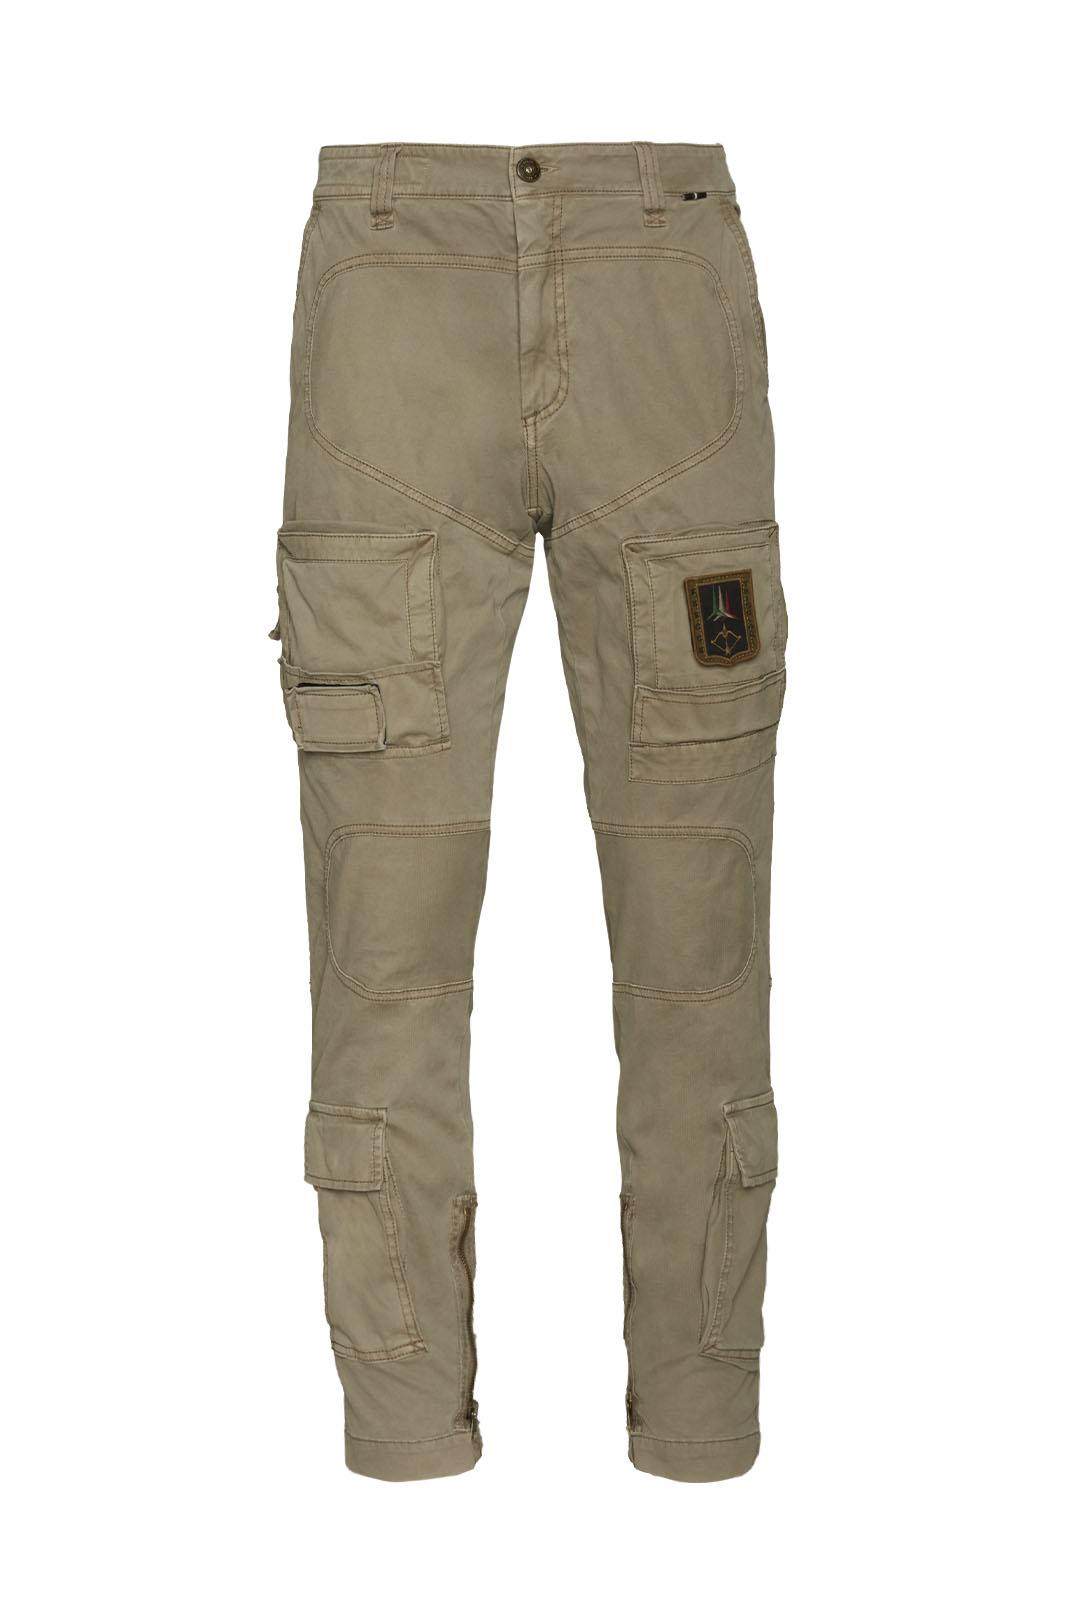 Pantalón Anti-G